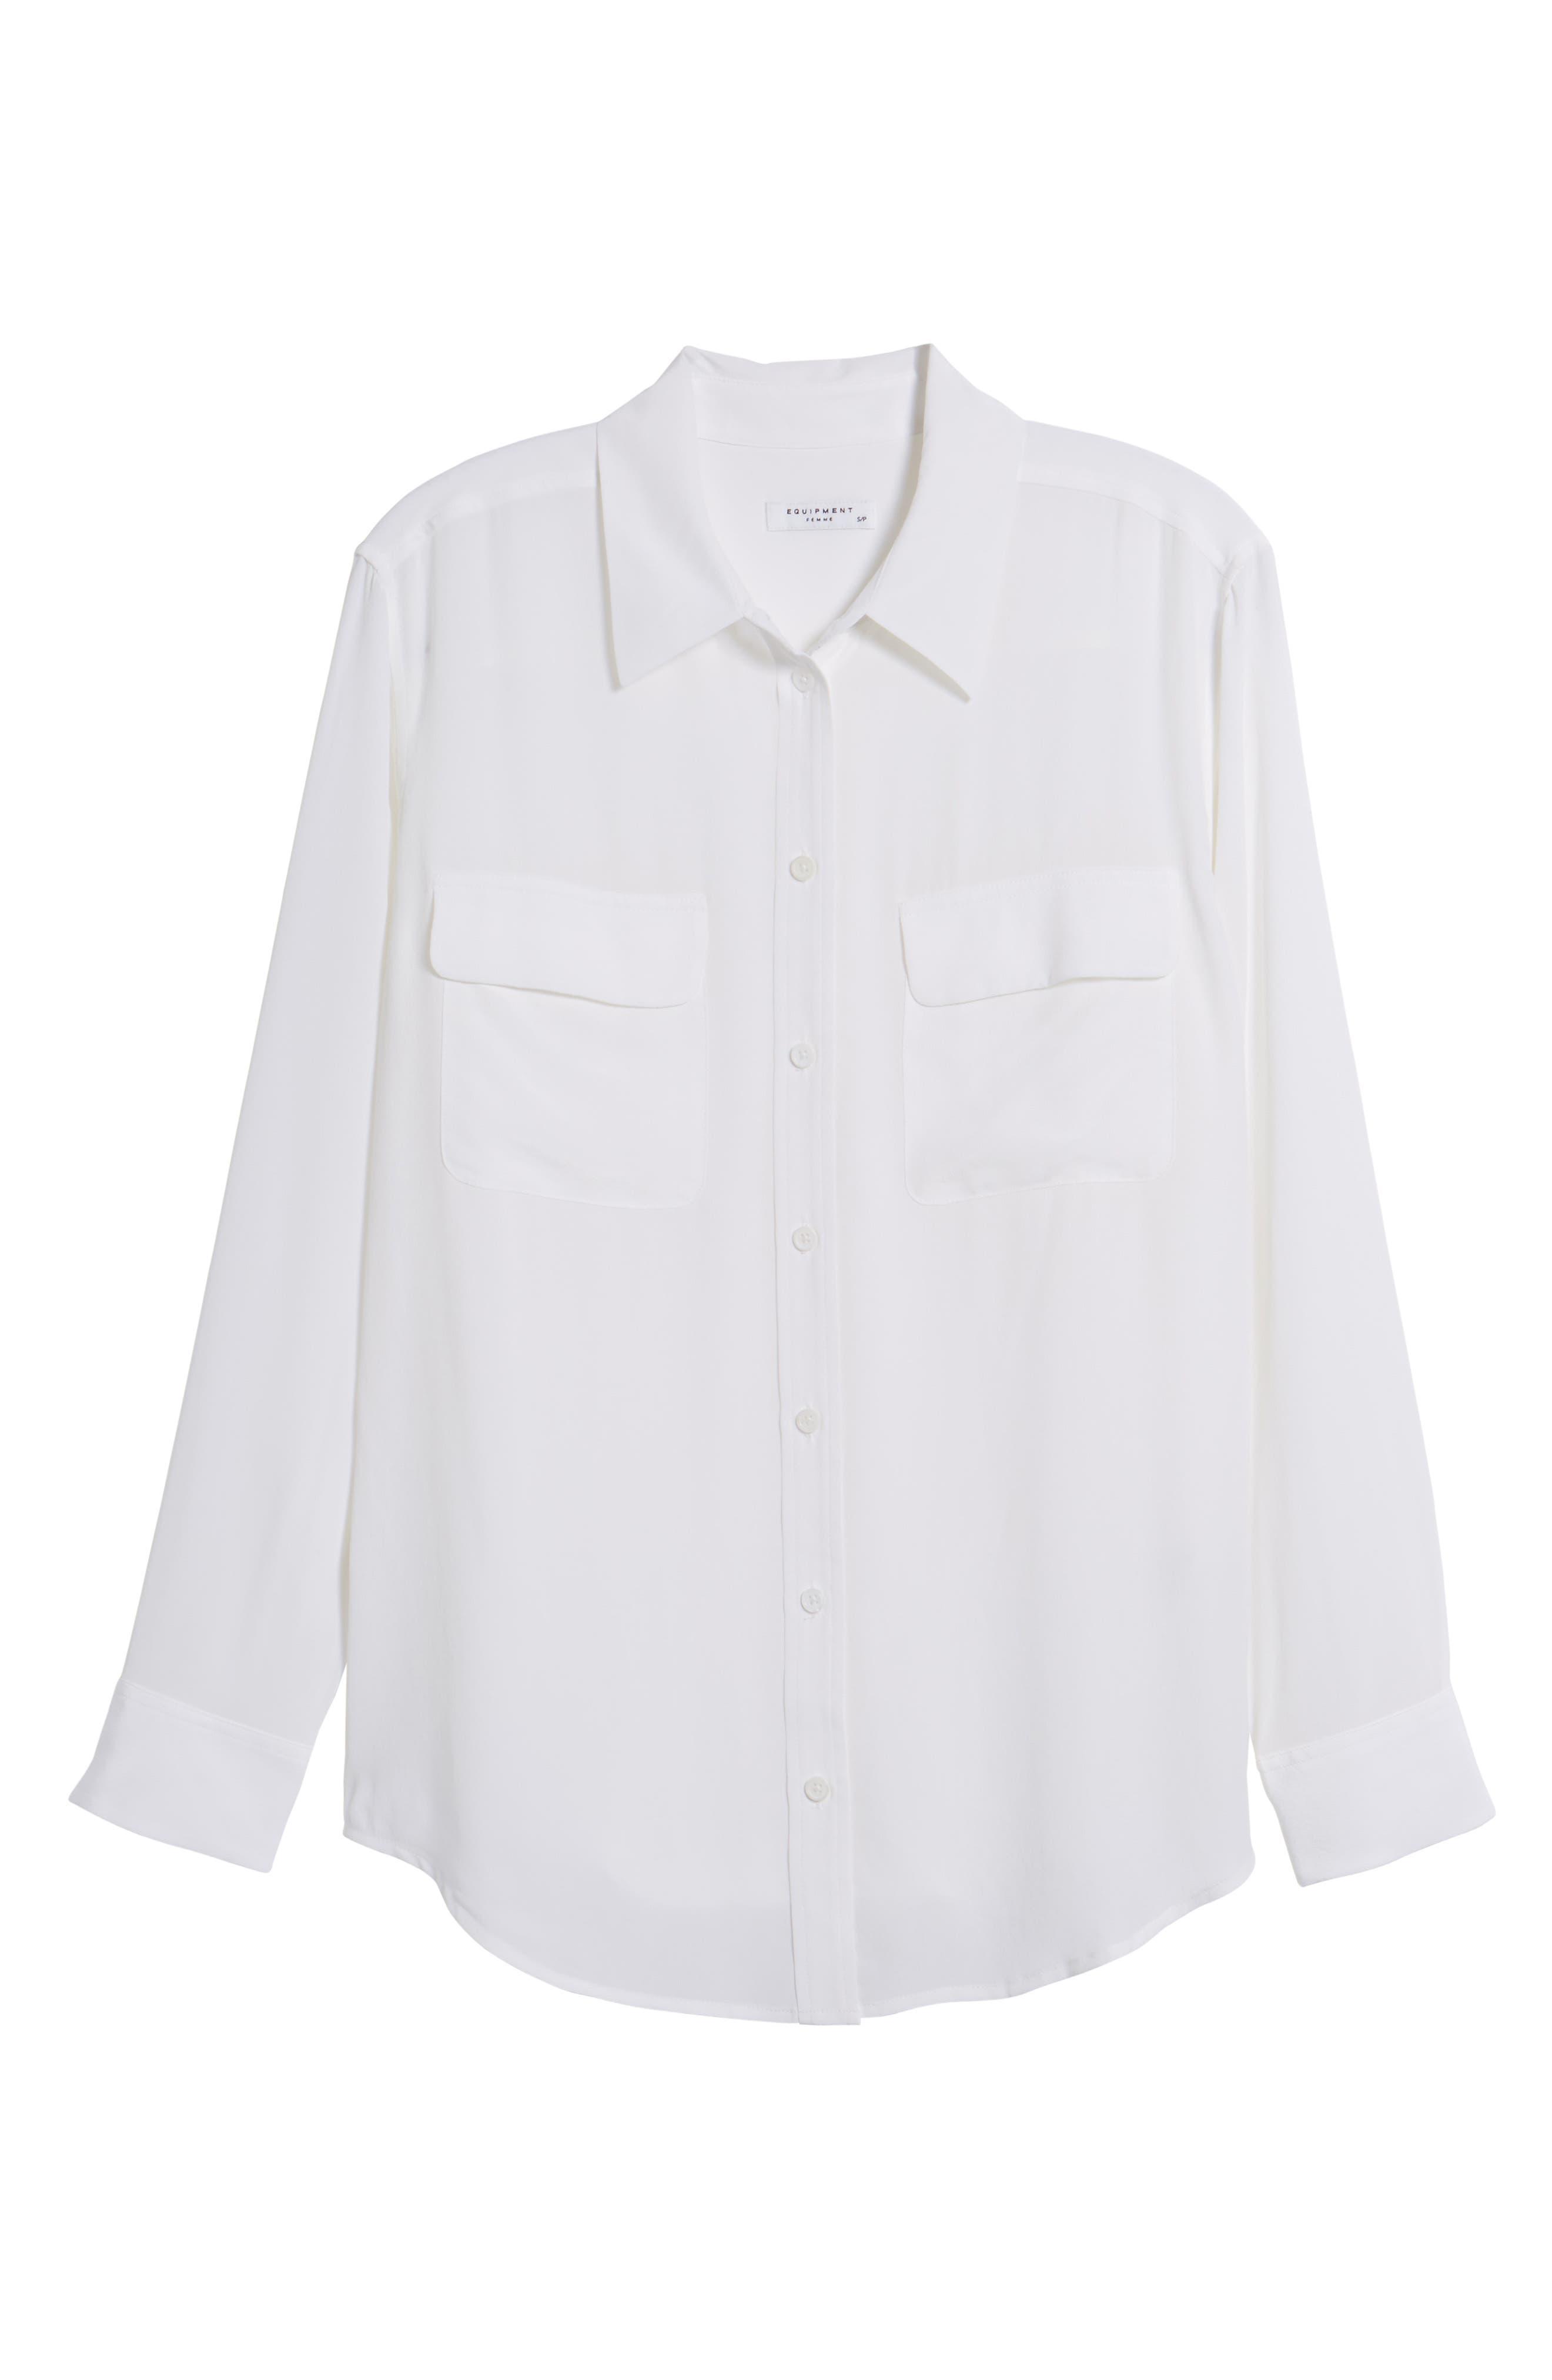 'Signature' Silk Shirt,                             Alternate thumbnail 6, color,                             Bright White